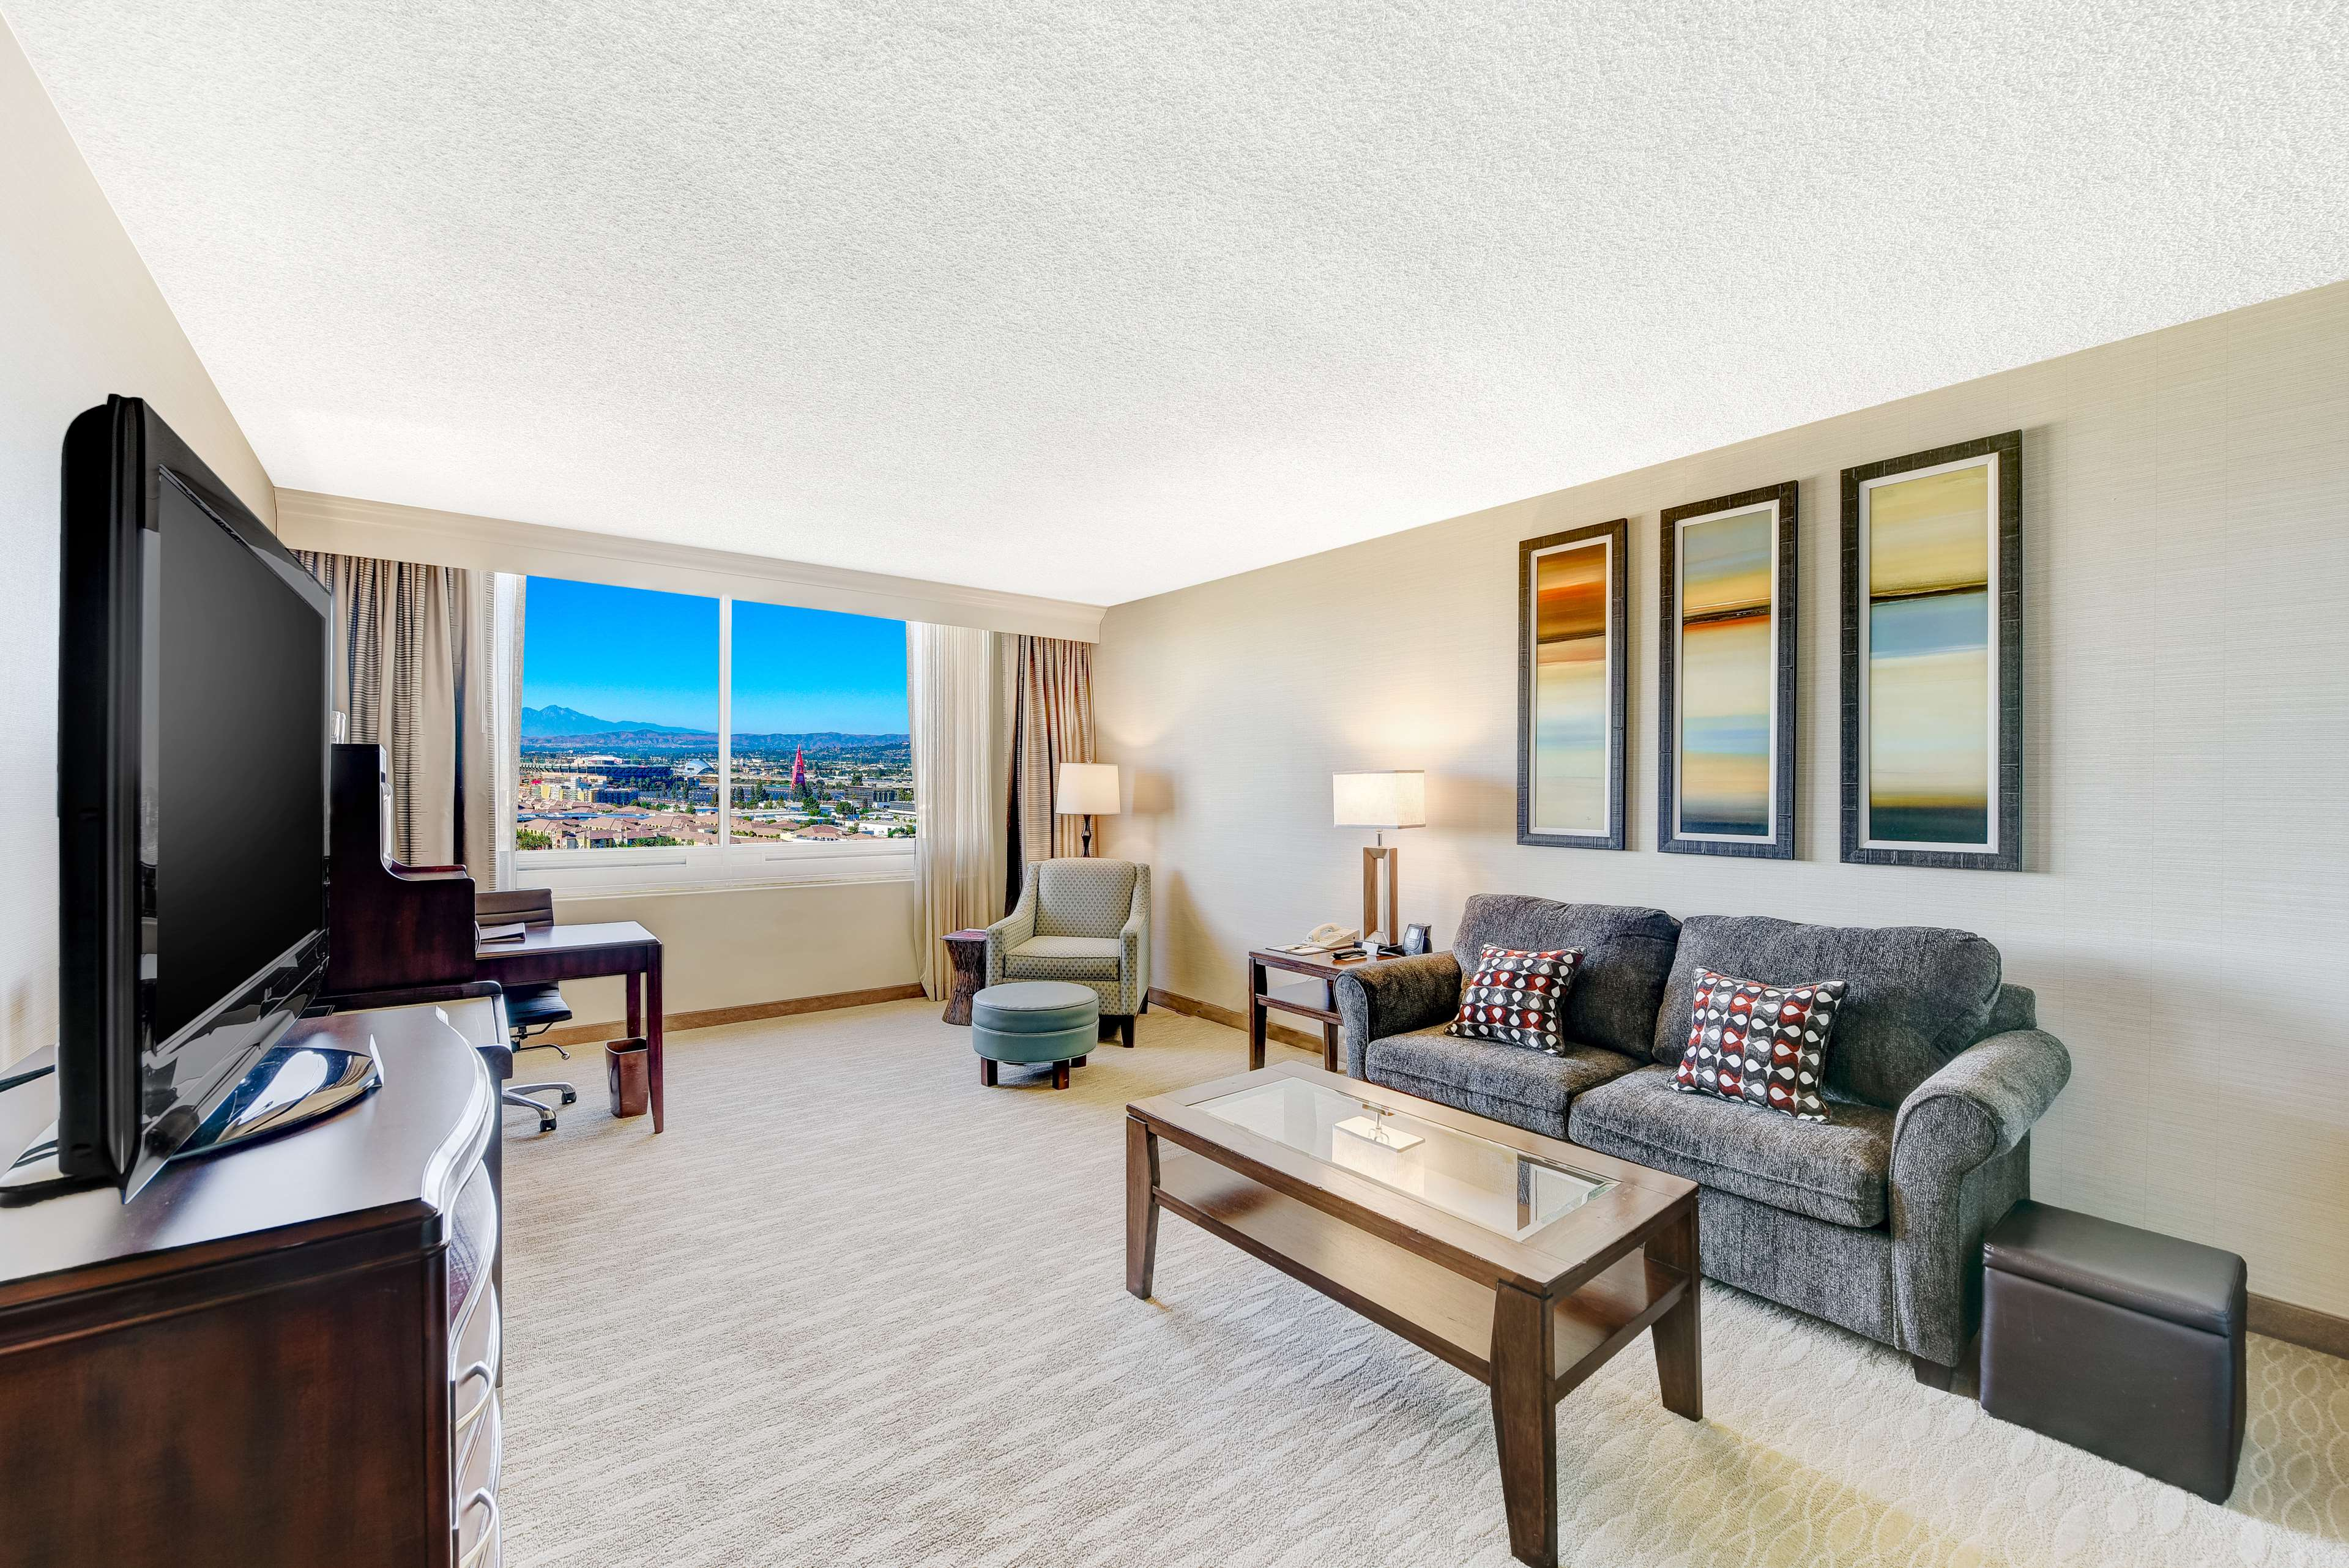 DoubleTree by Hilton Hotel Anaheim - Orange County image 41